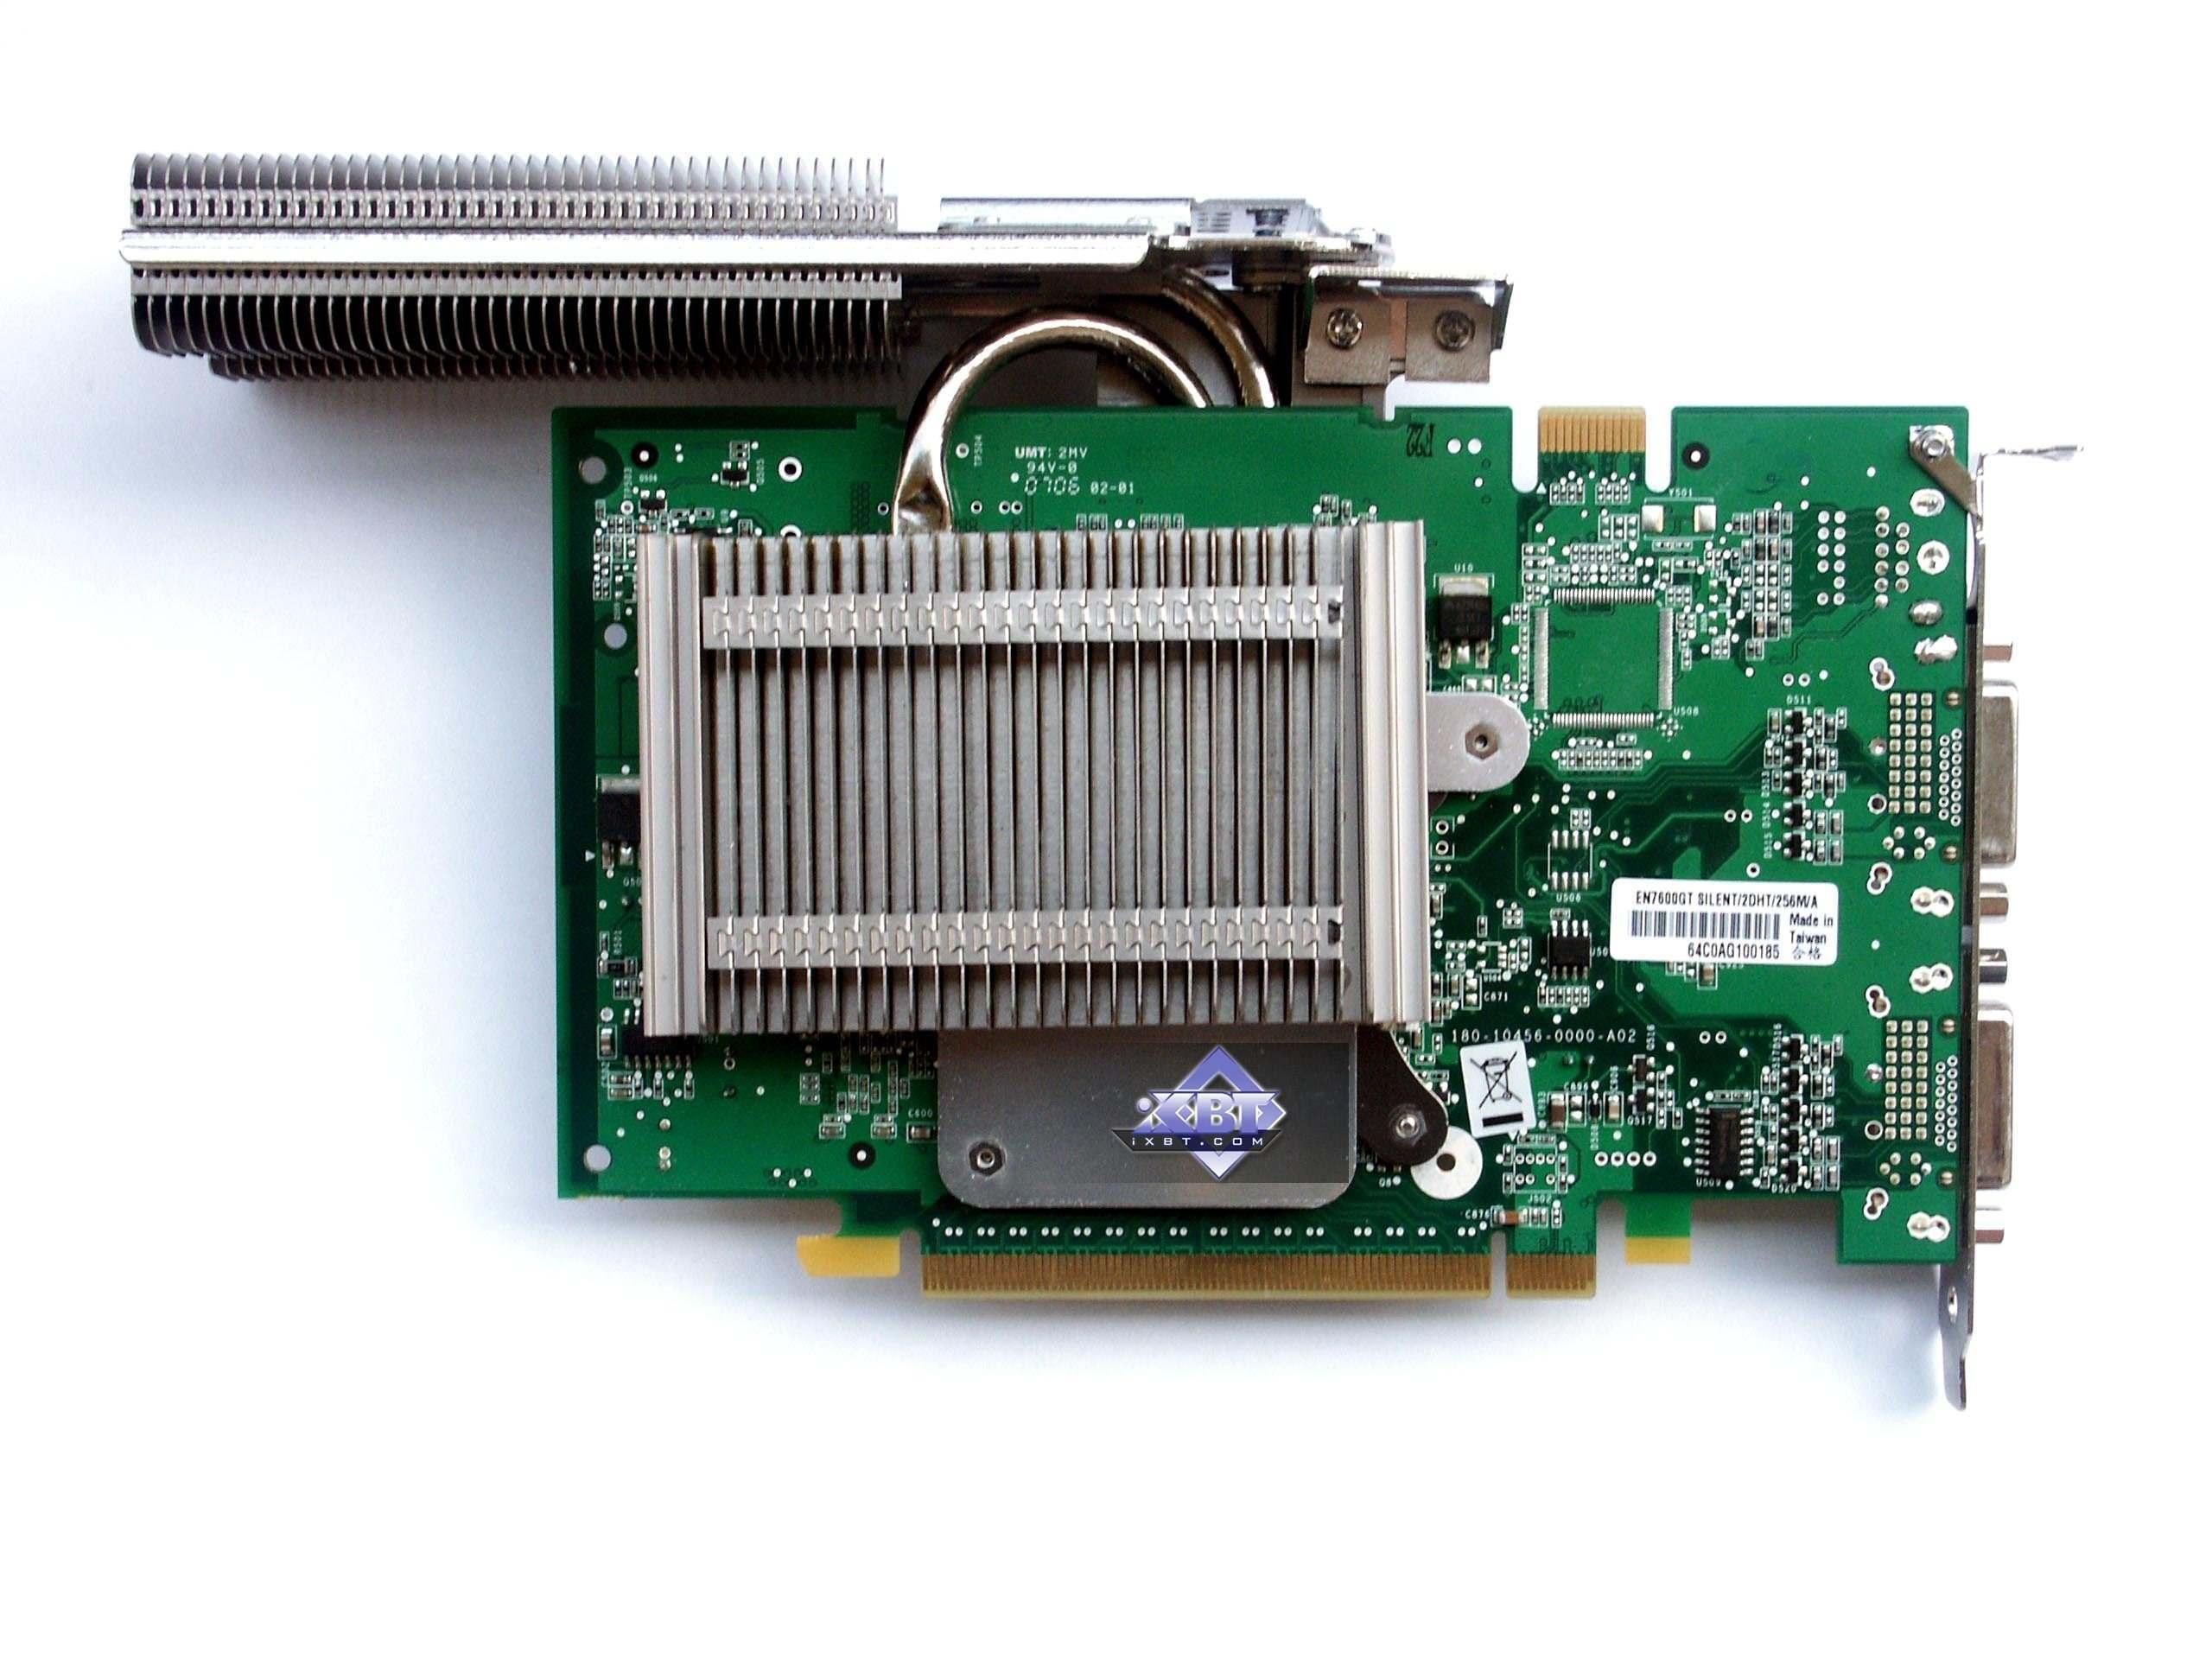 Купить видеокарту nvidia geforce 7600 купить видеокарту для ноутбука dns